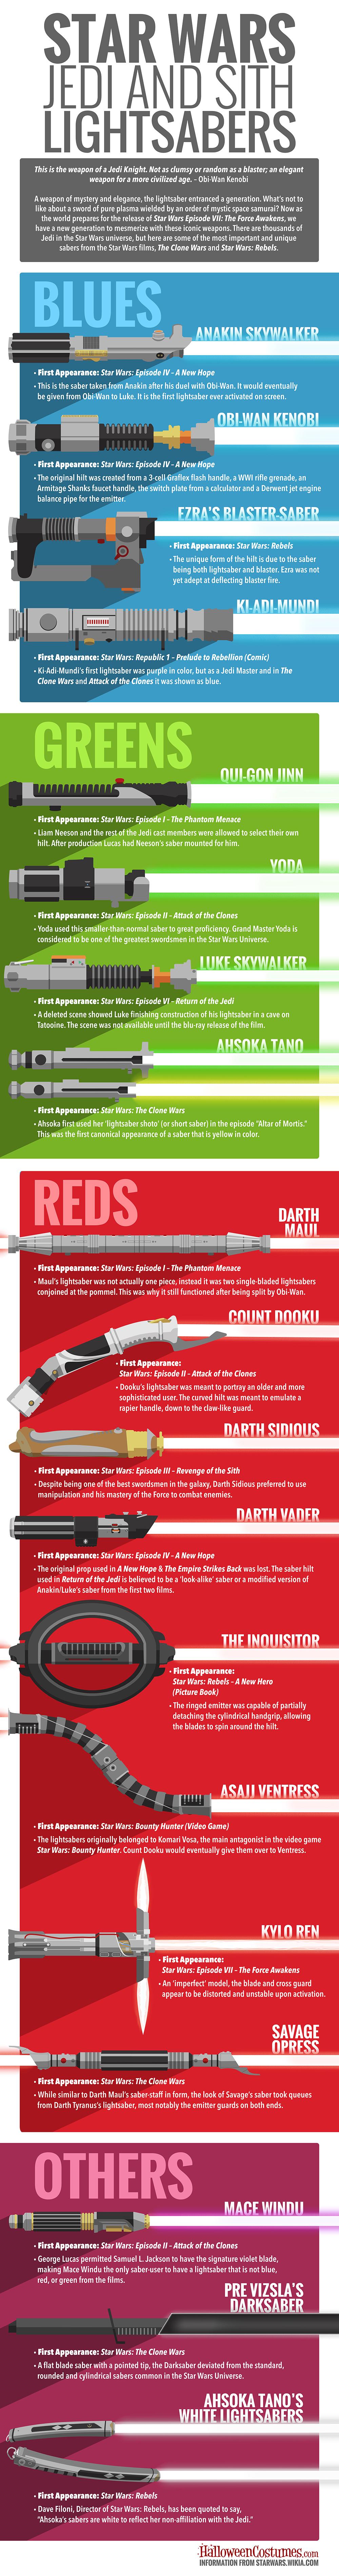 star-wars-sables-de-luz-infografia